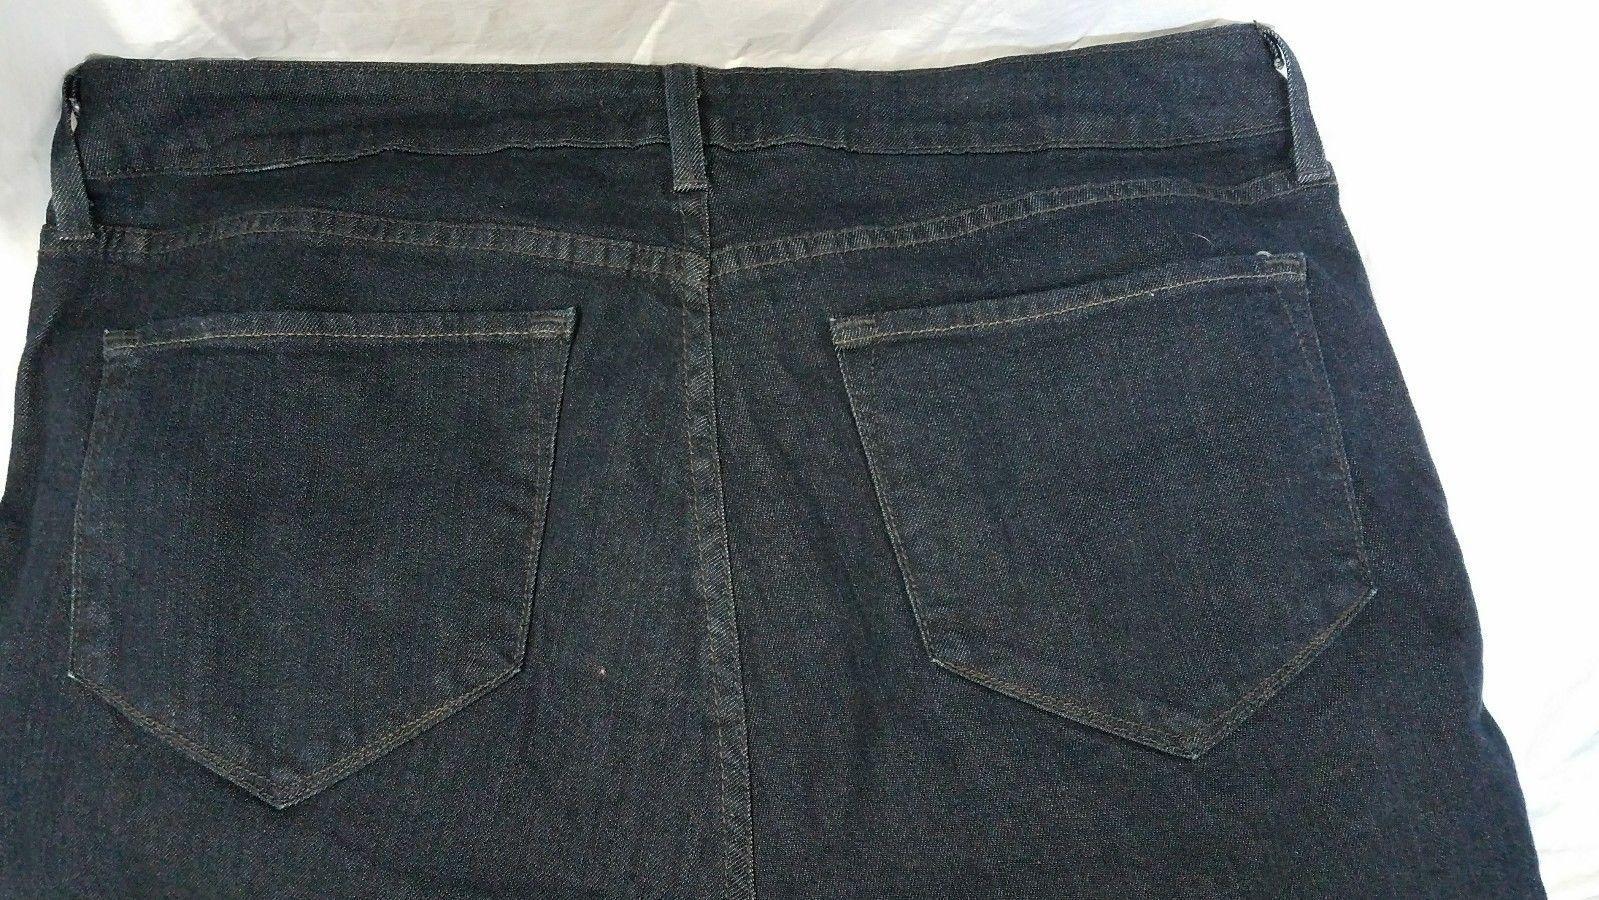 NYXD Dark Blue Denim Jeans Boot Cut Size 14W